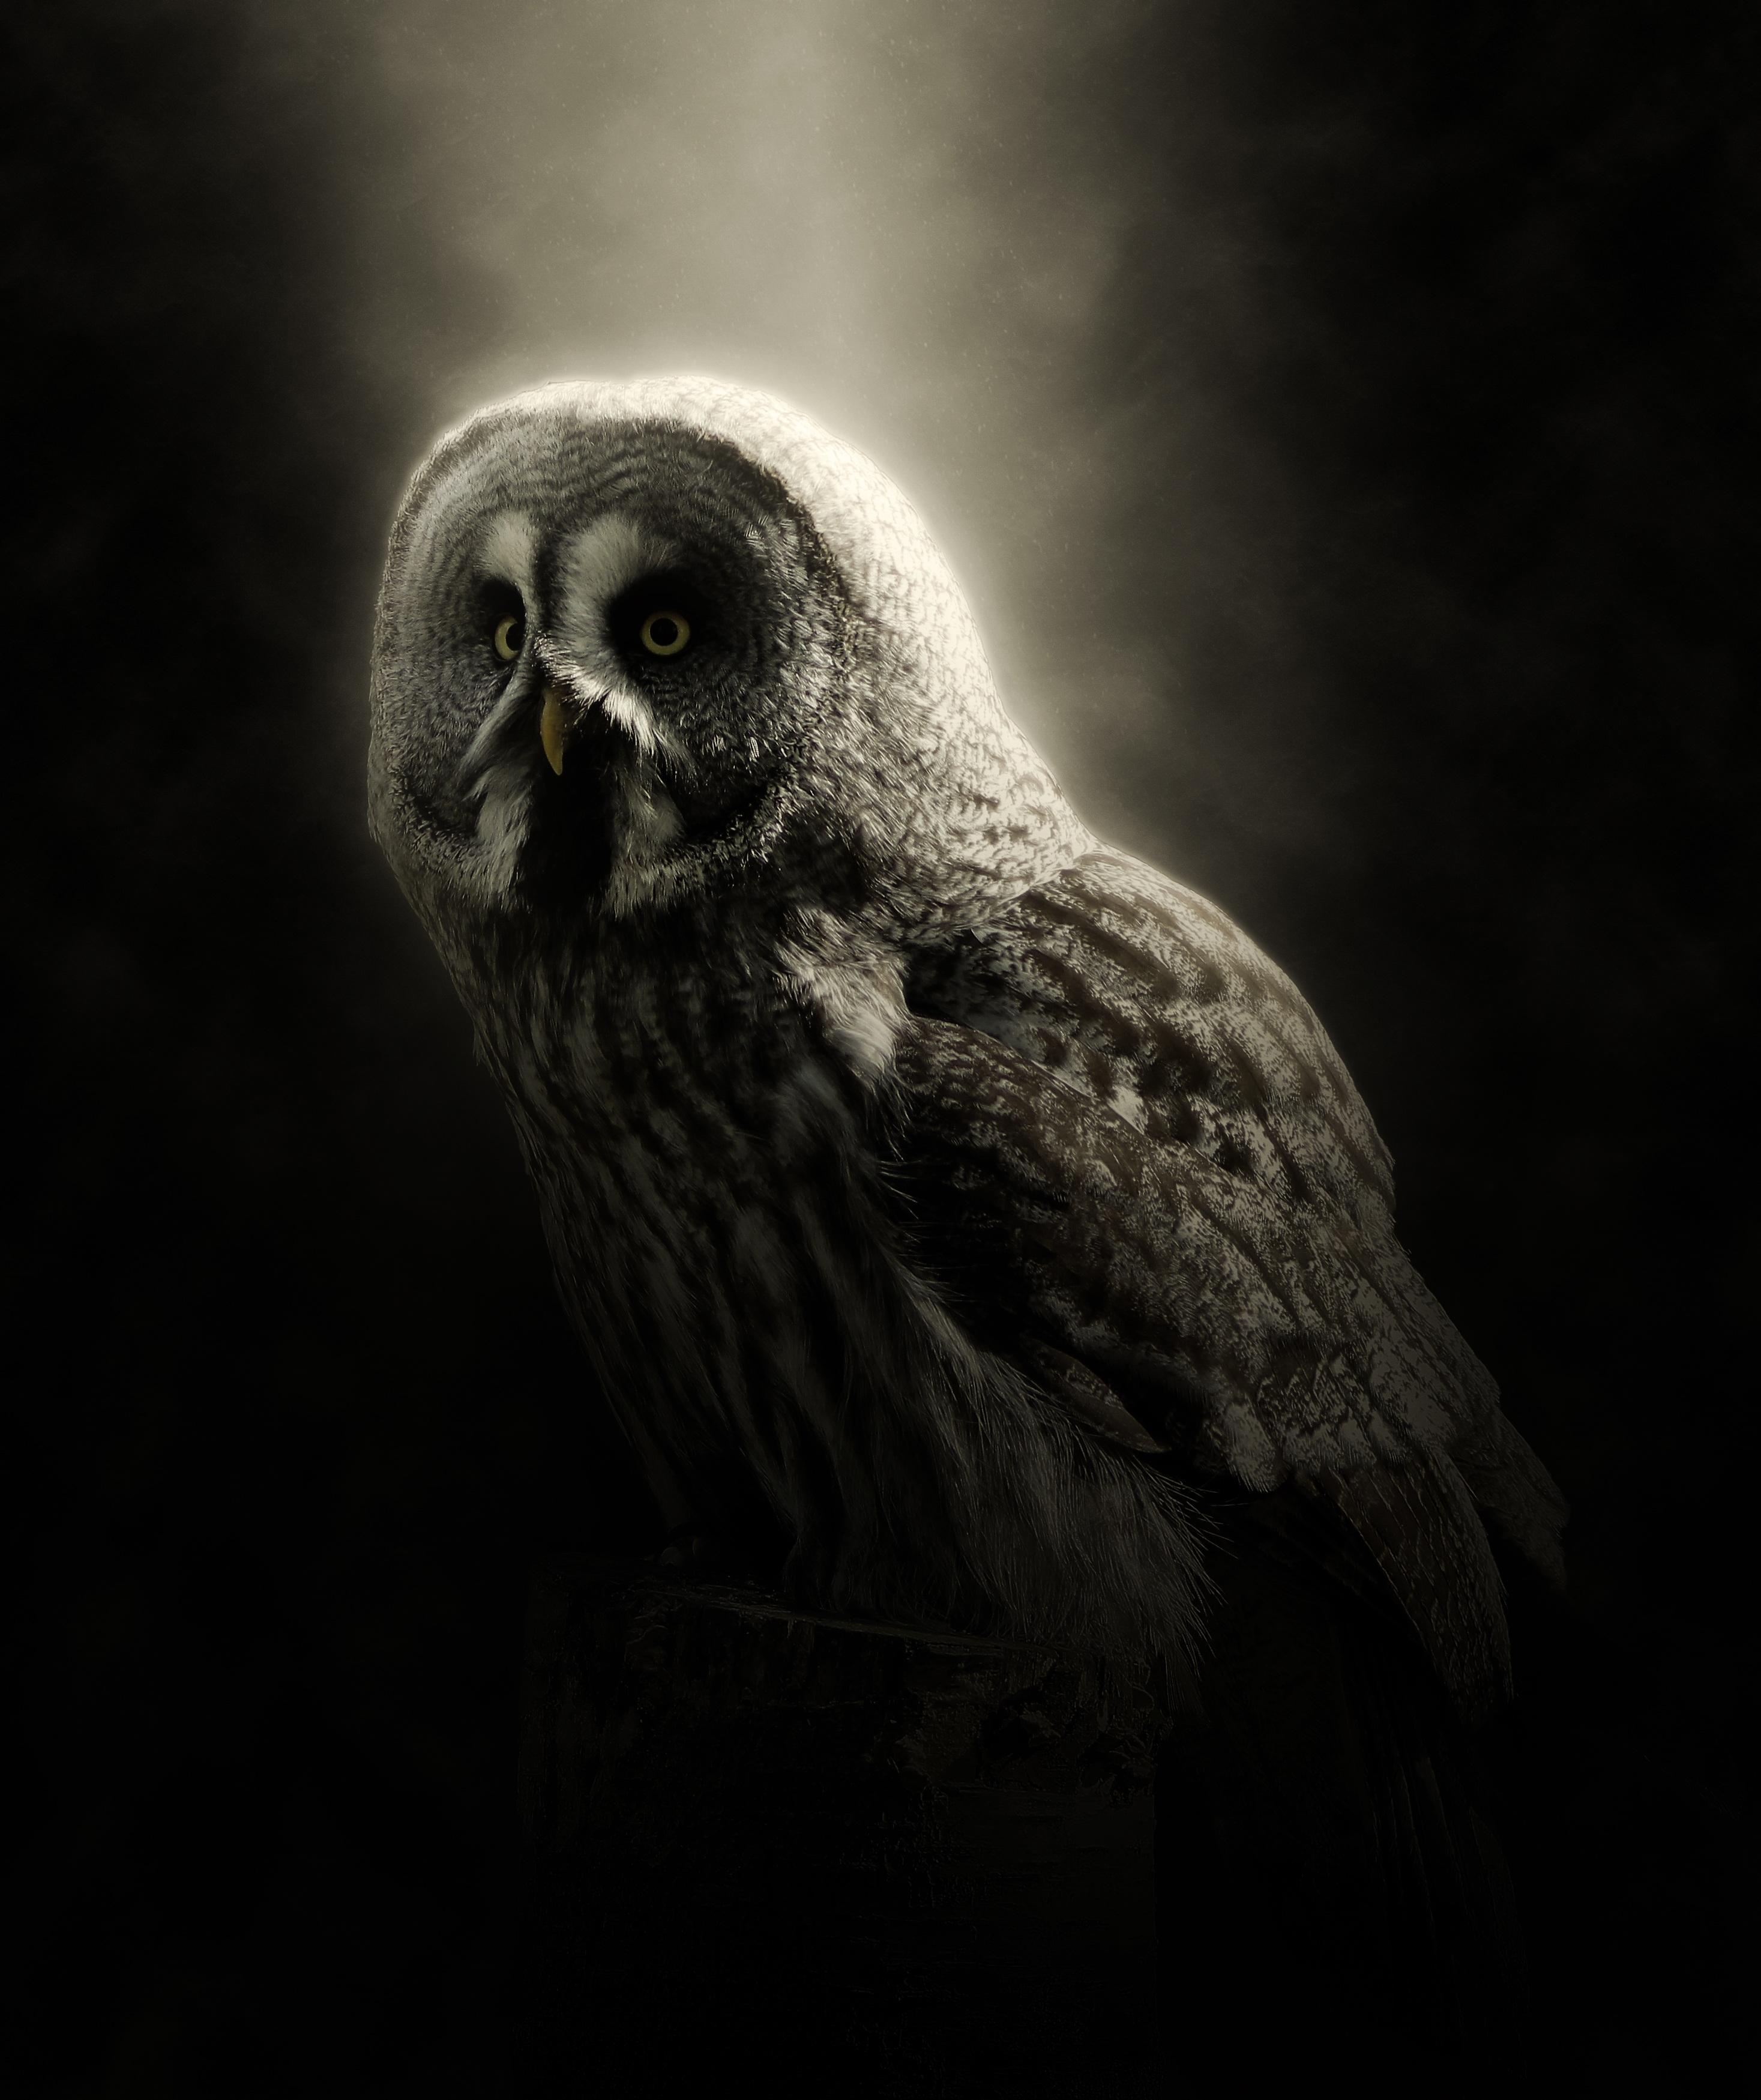 154195 download wallpaper Animals, Owl, Bird, Predator, Dark, Wildlife screensavers and pictures for free